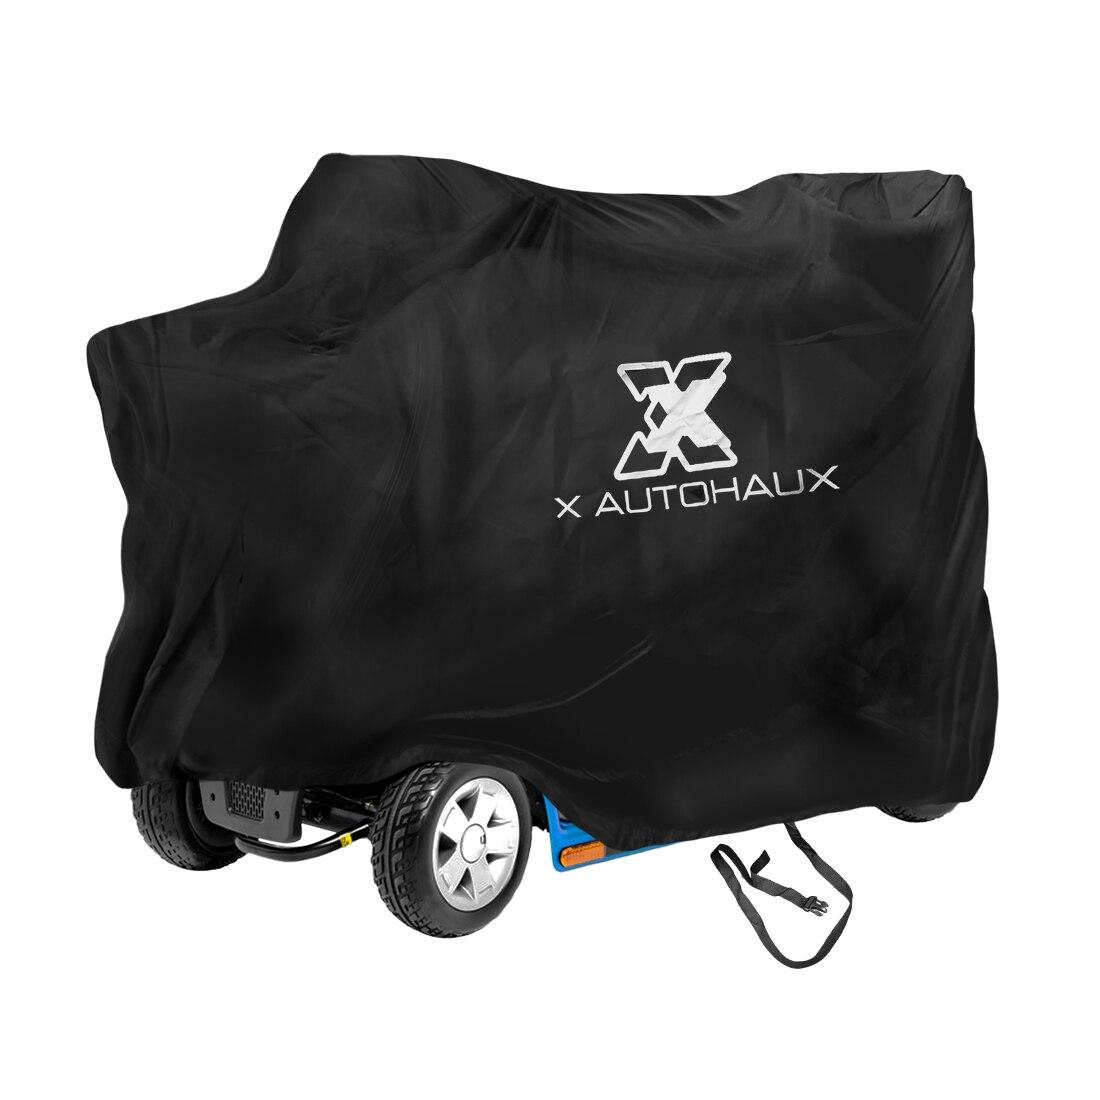 Чехол для скутера X Autohaux водонепроницаемый чехол 210D с защитой от дождя защита